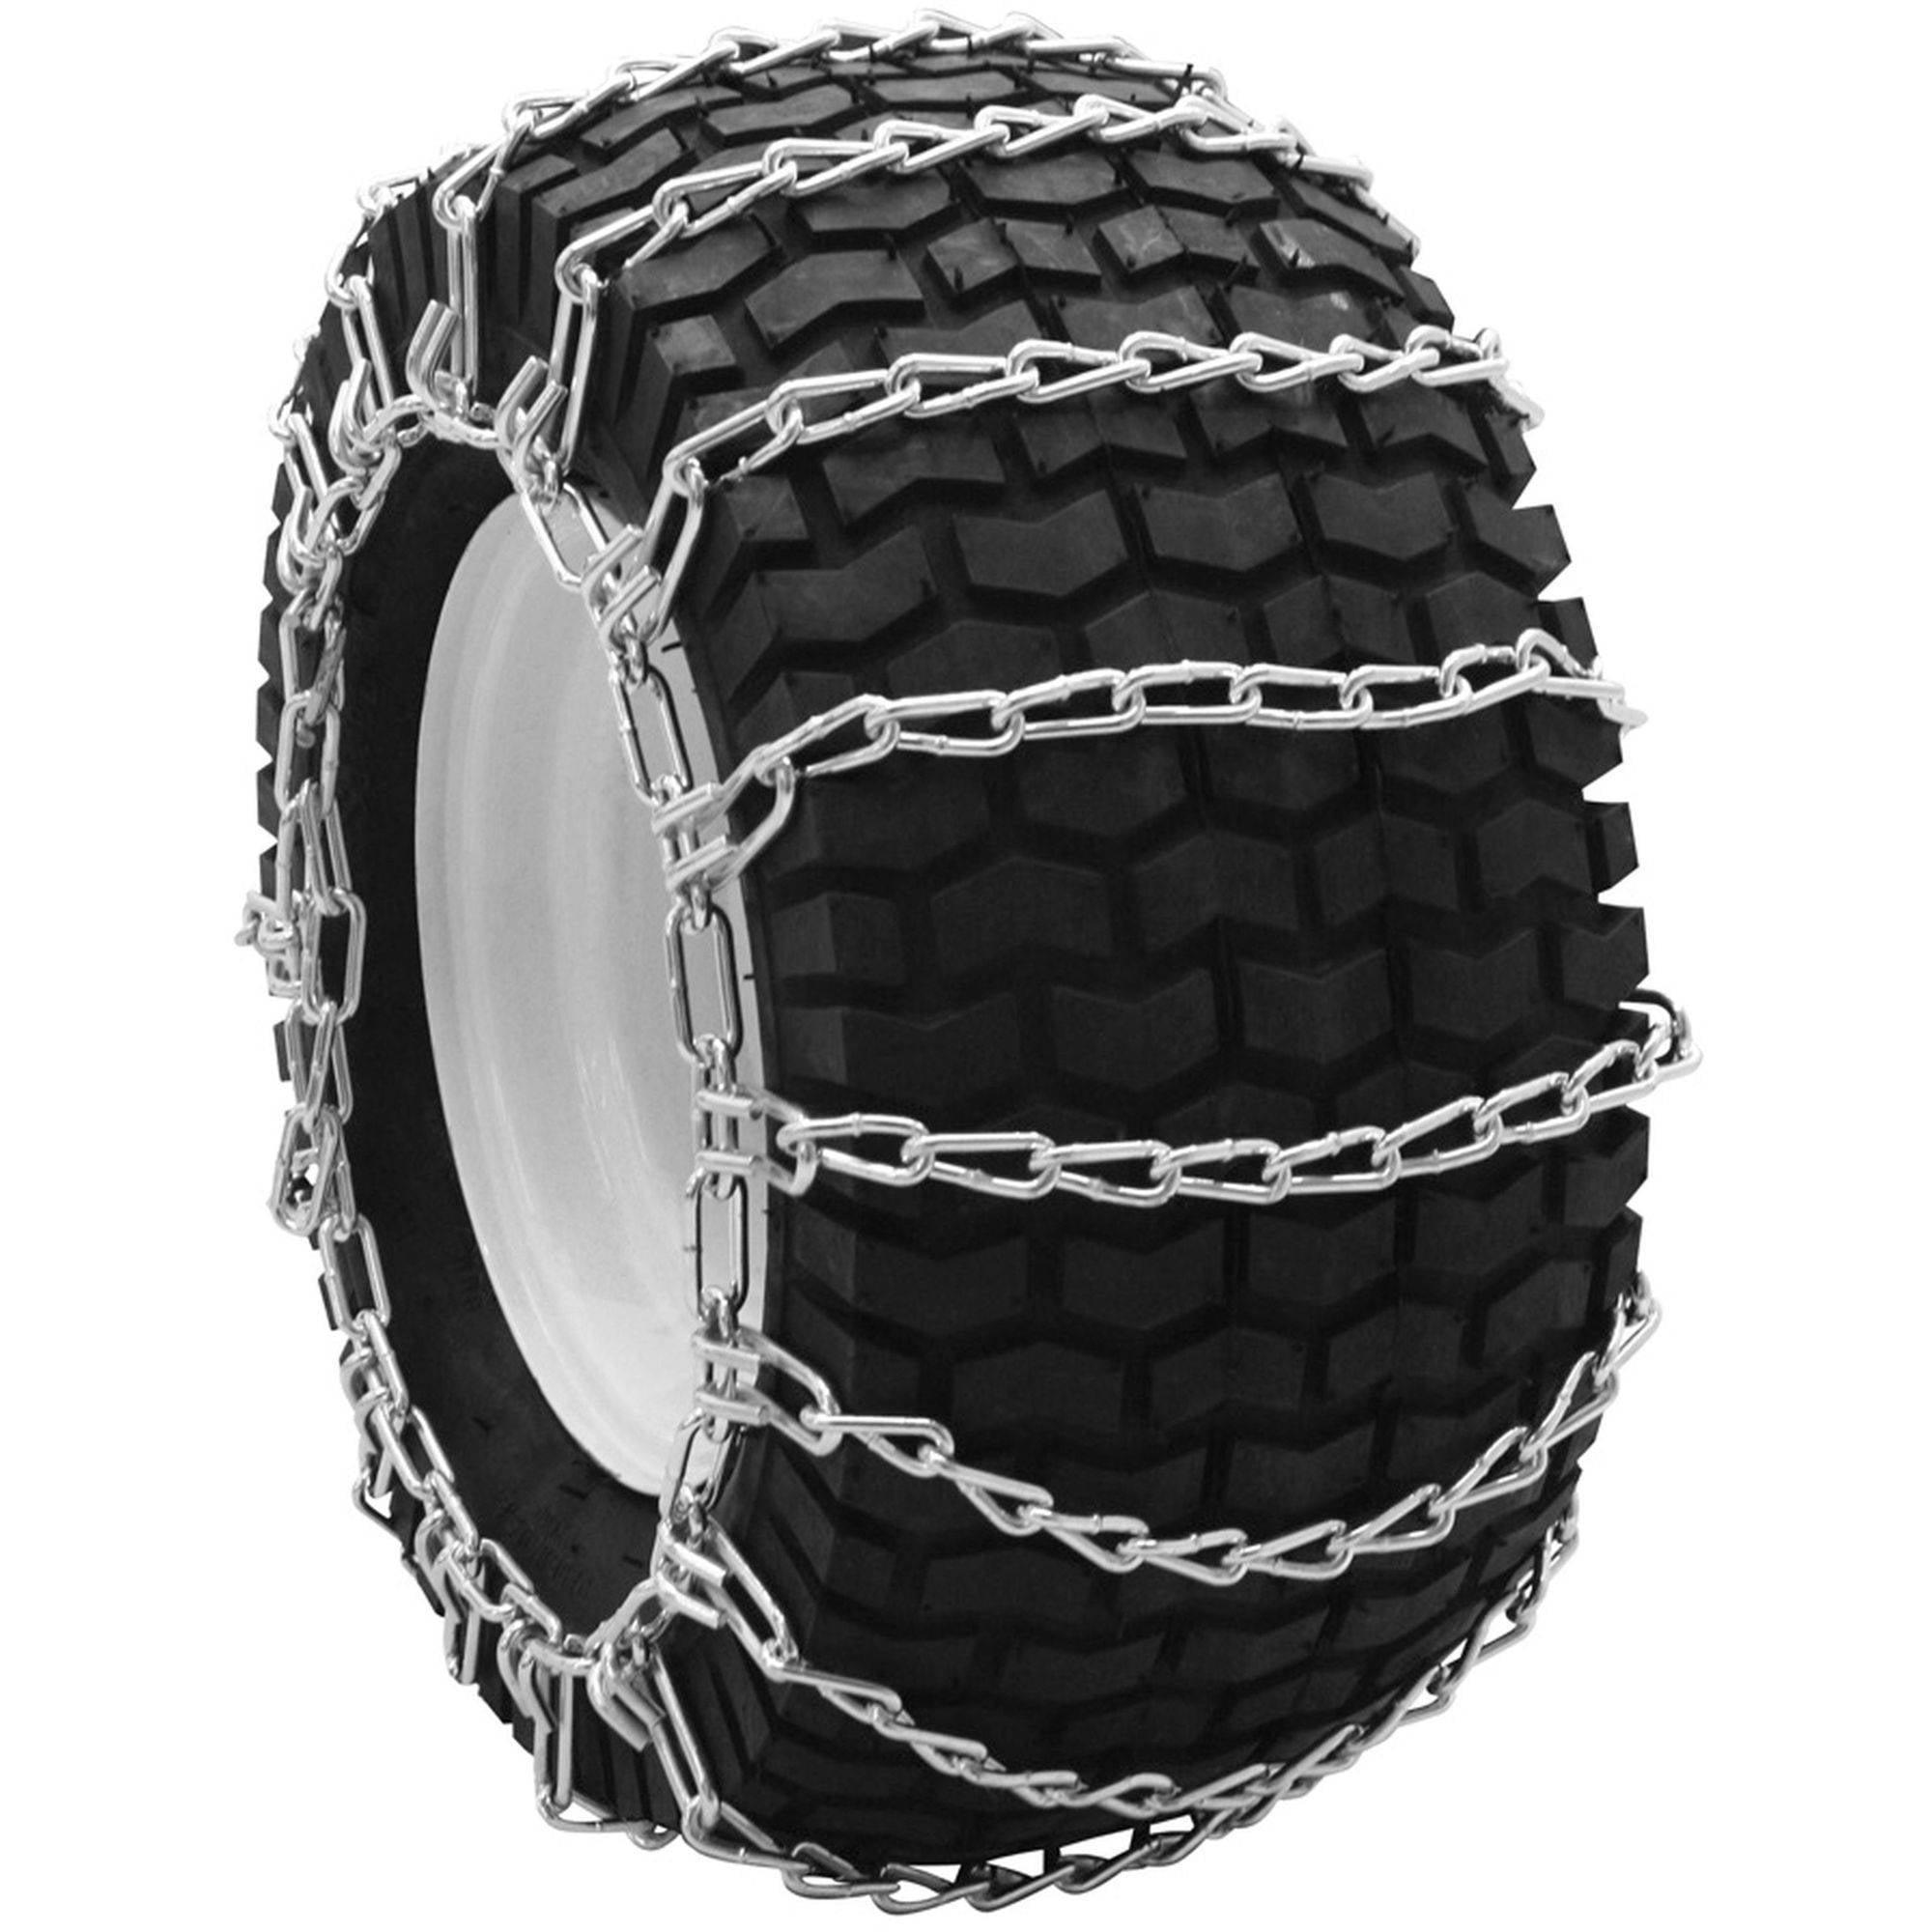 14X400X6 SnowBlowerTire Chains 2 Link Spacing